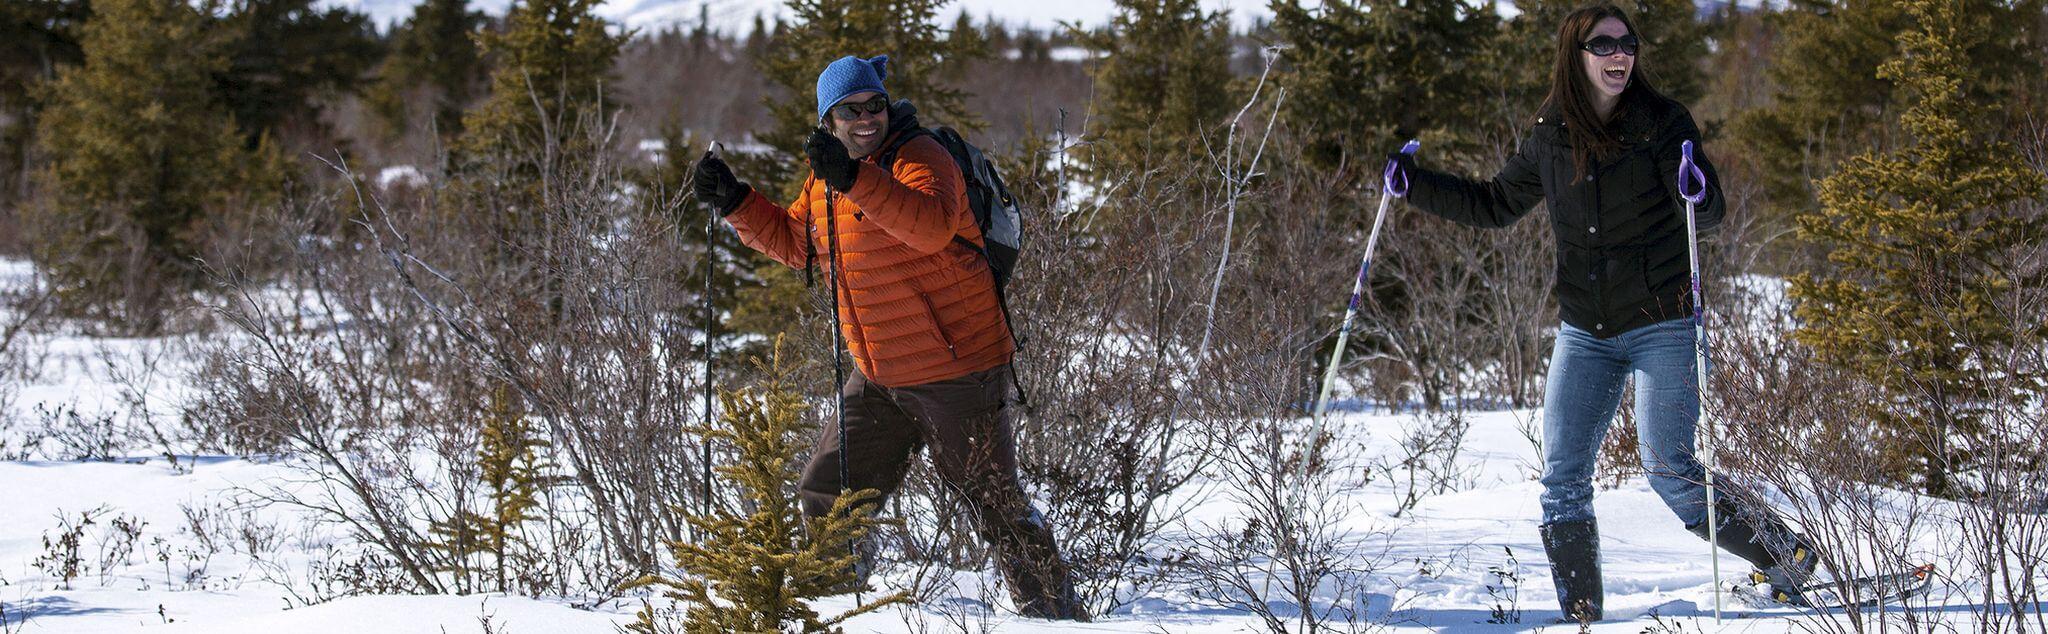 Snowshoeing in Tona